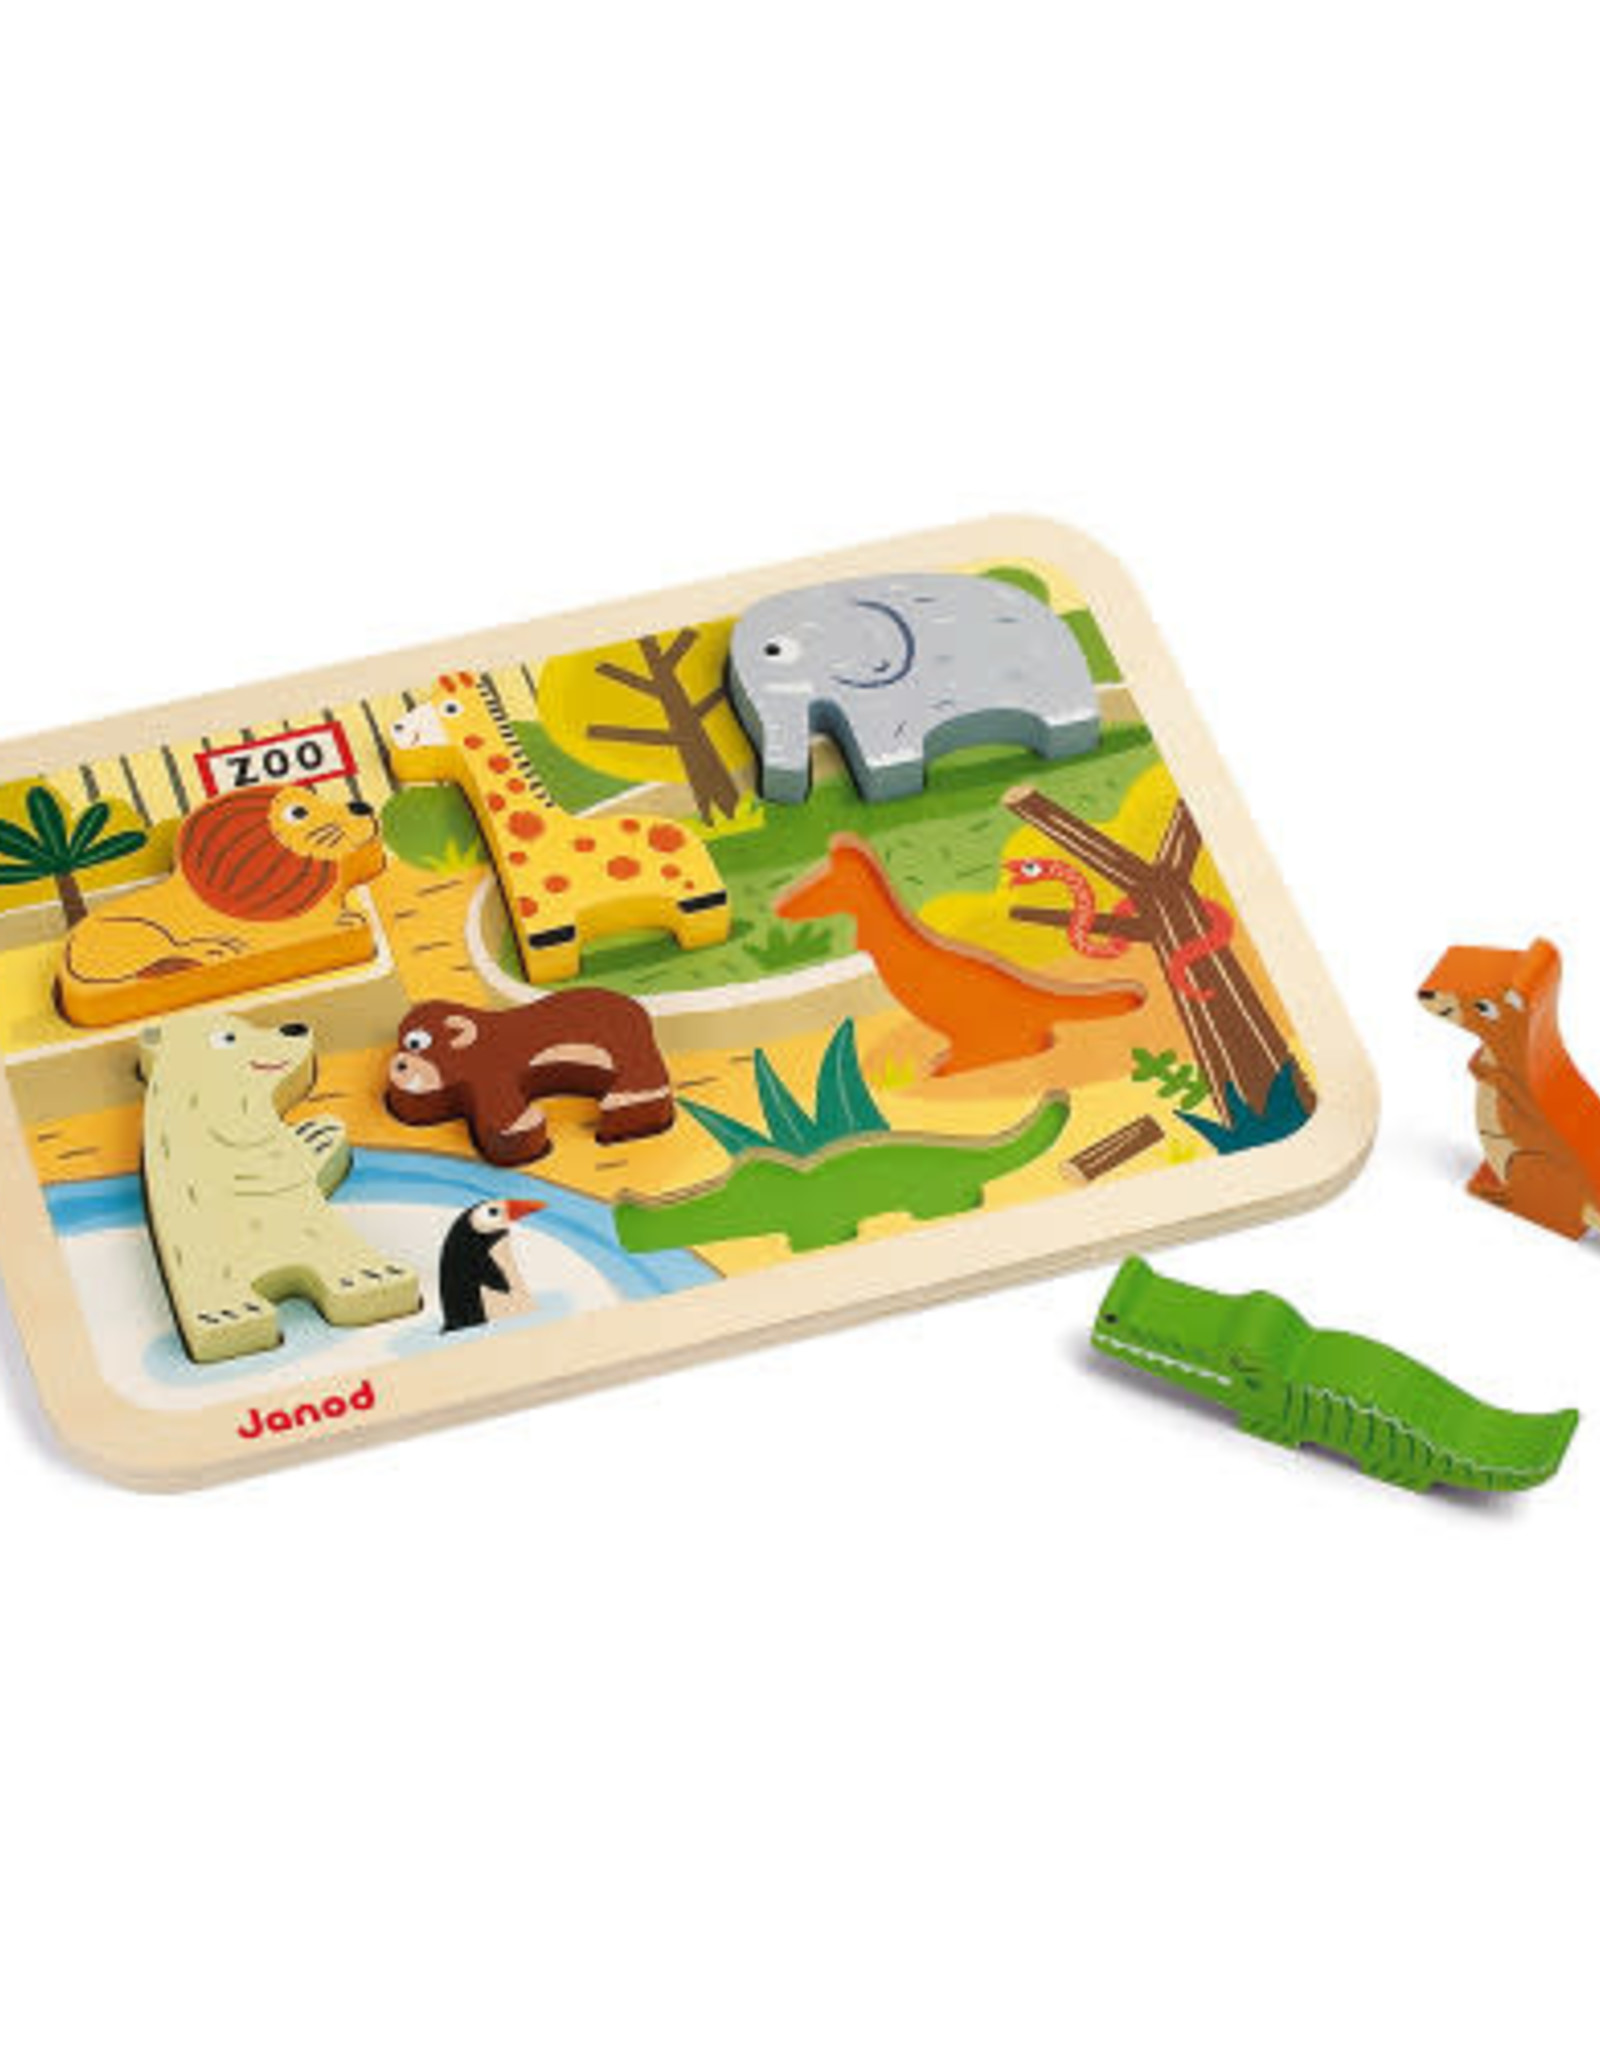 Janod chunky puzzle- zoo